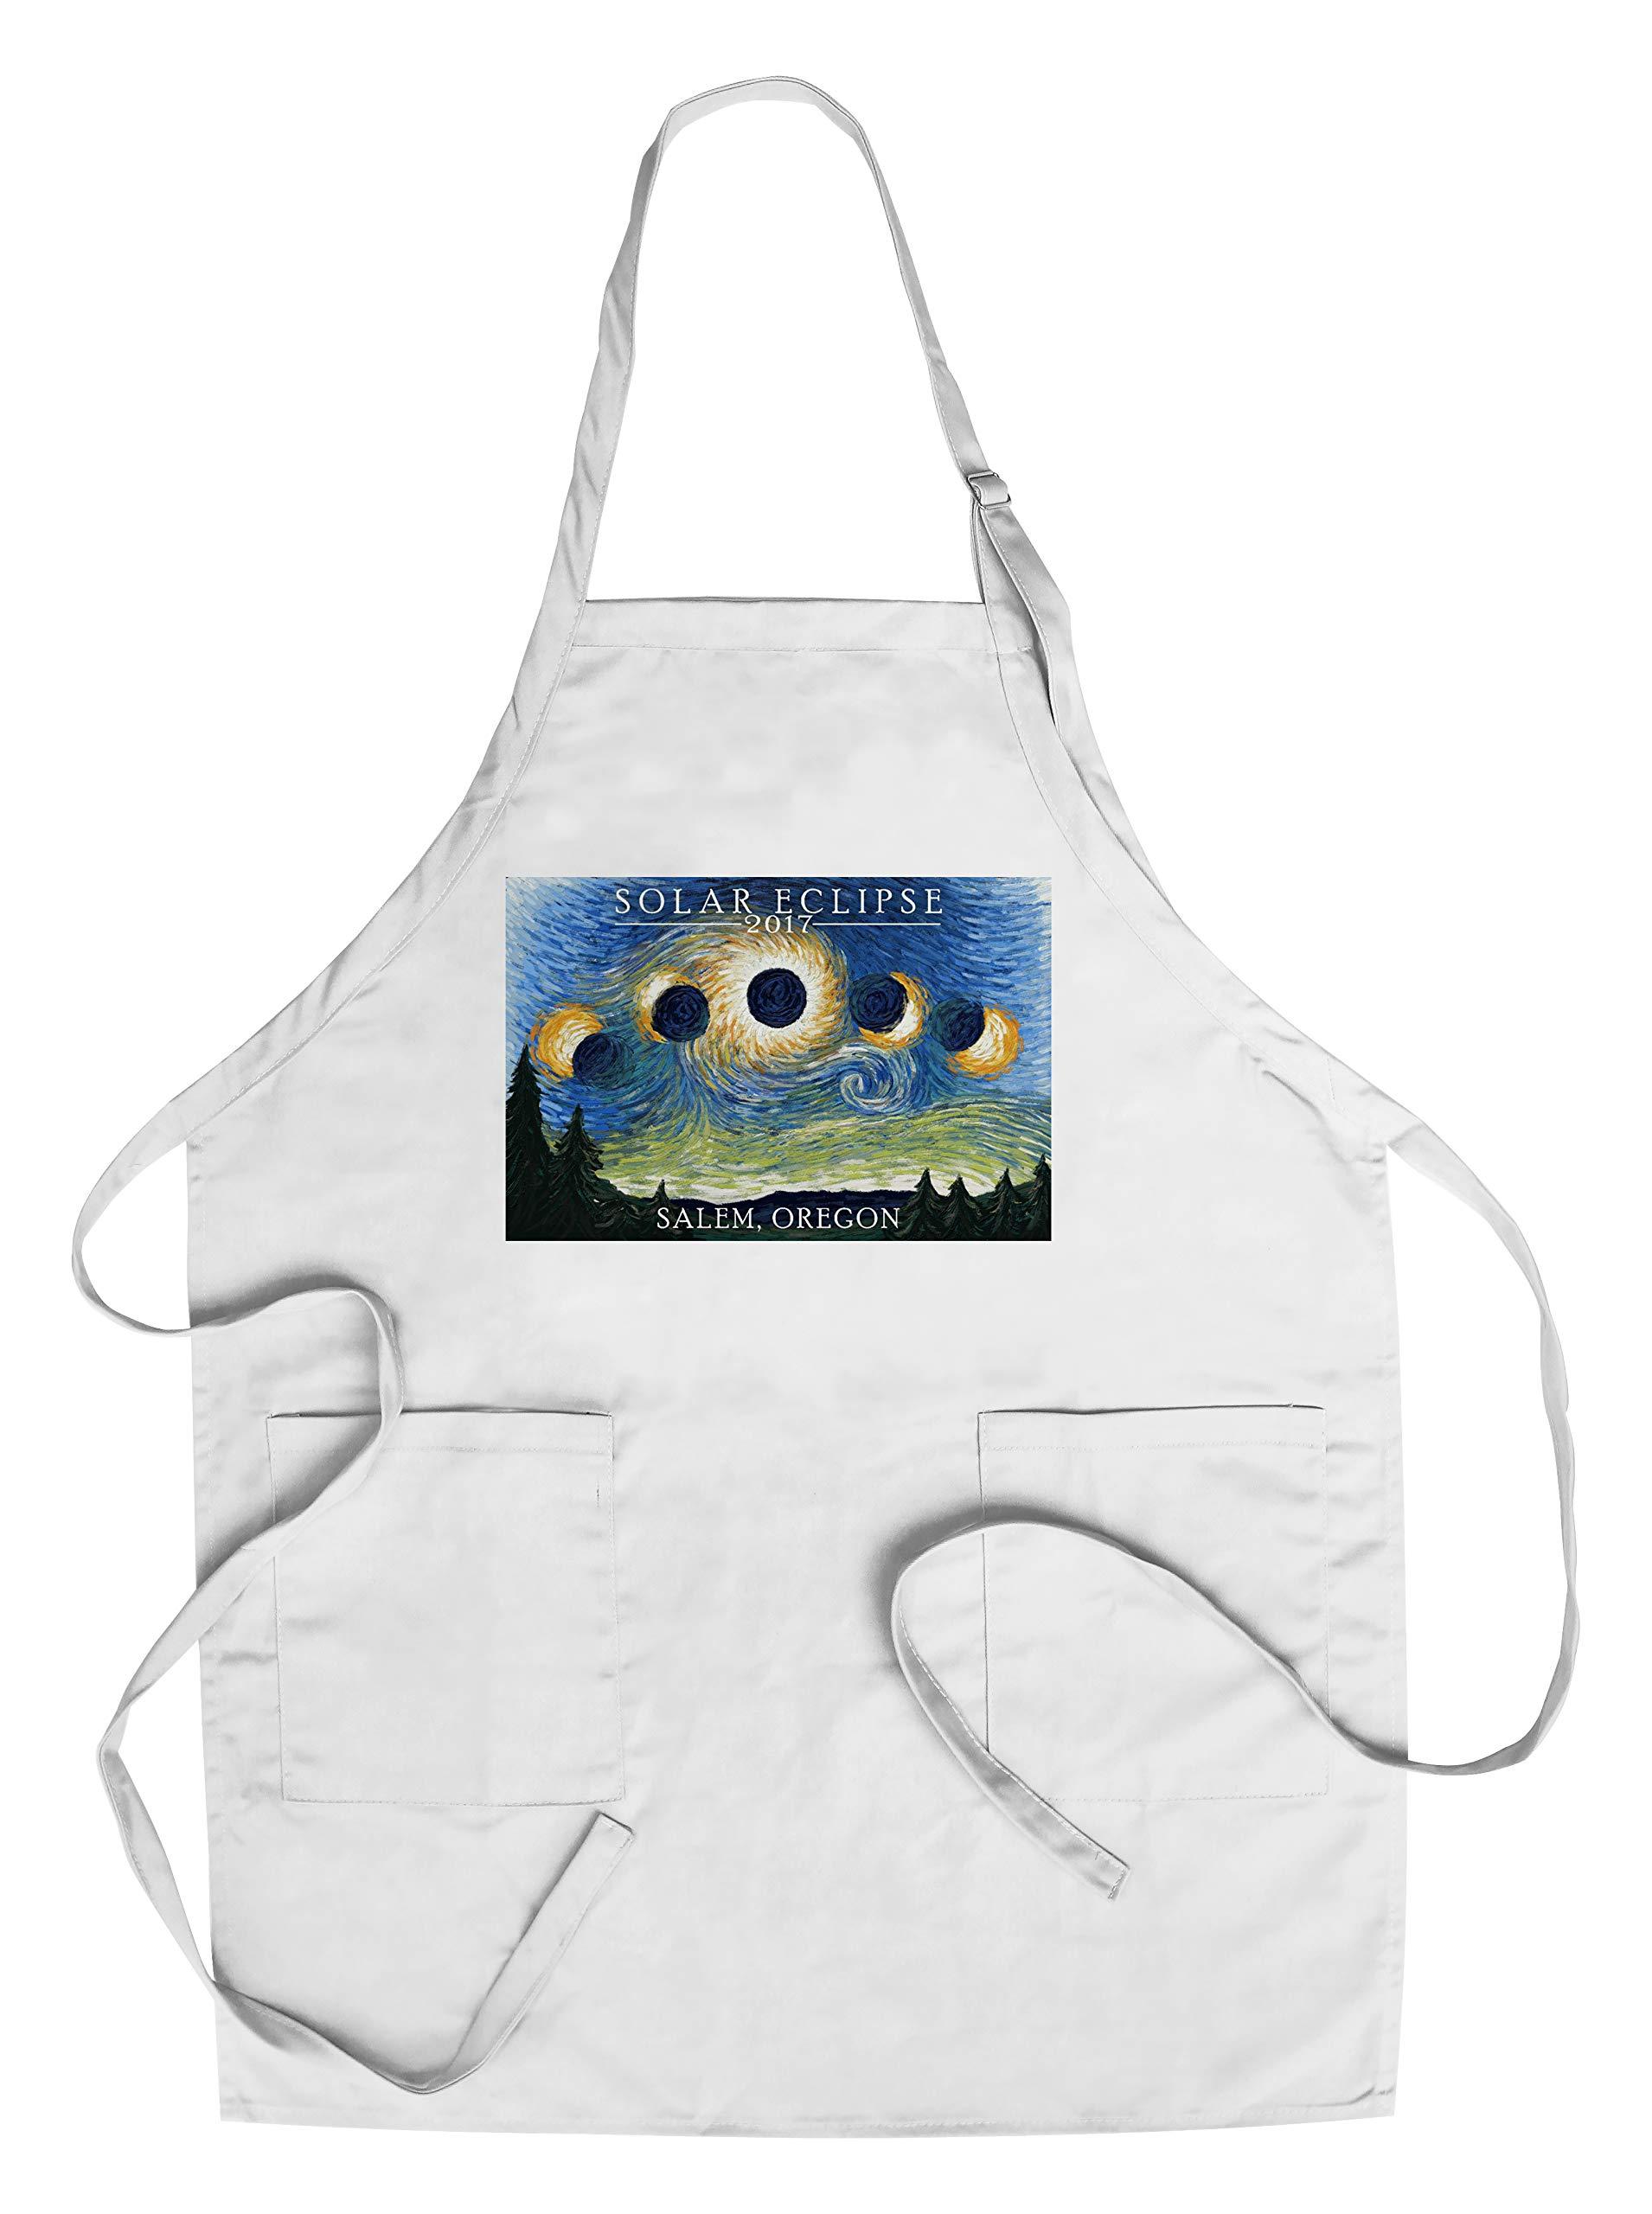 Salem, Oregon - Solar Eclipse 2017 - Starry Night (Cotton/Polyester Chef's Apron)